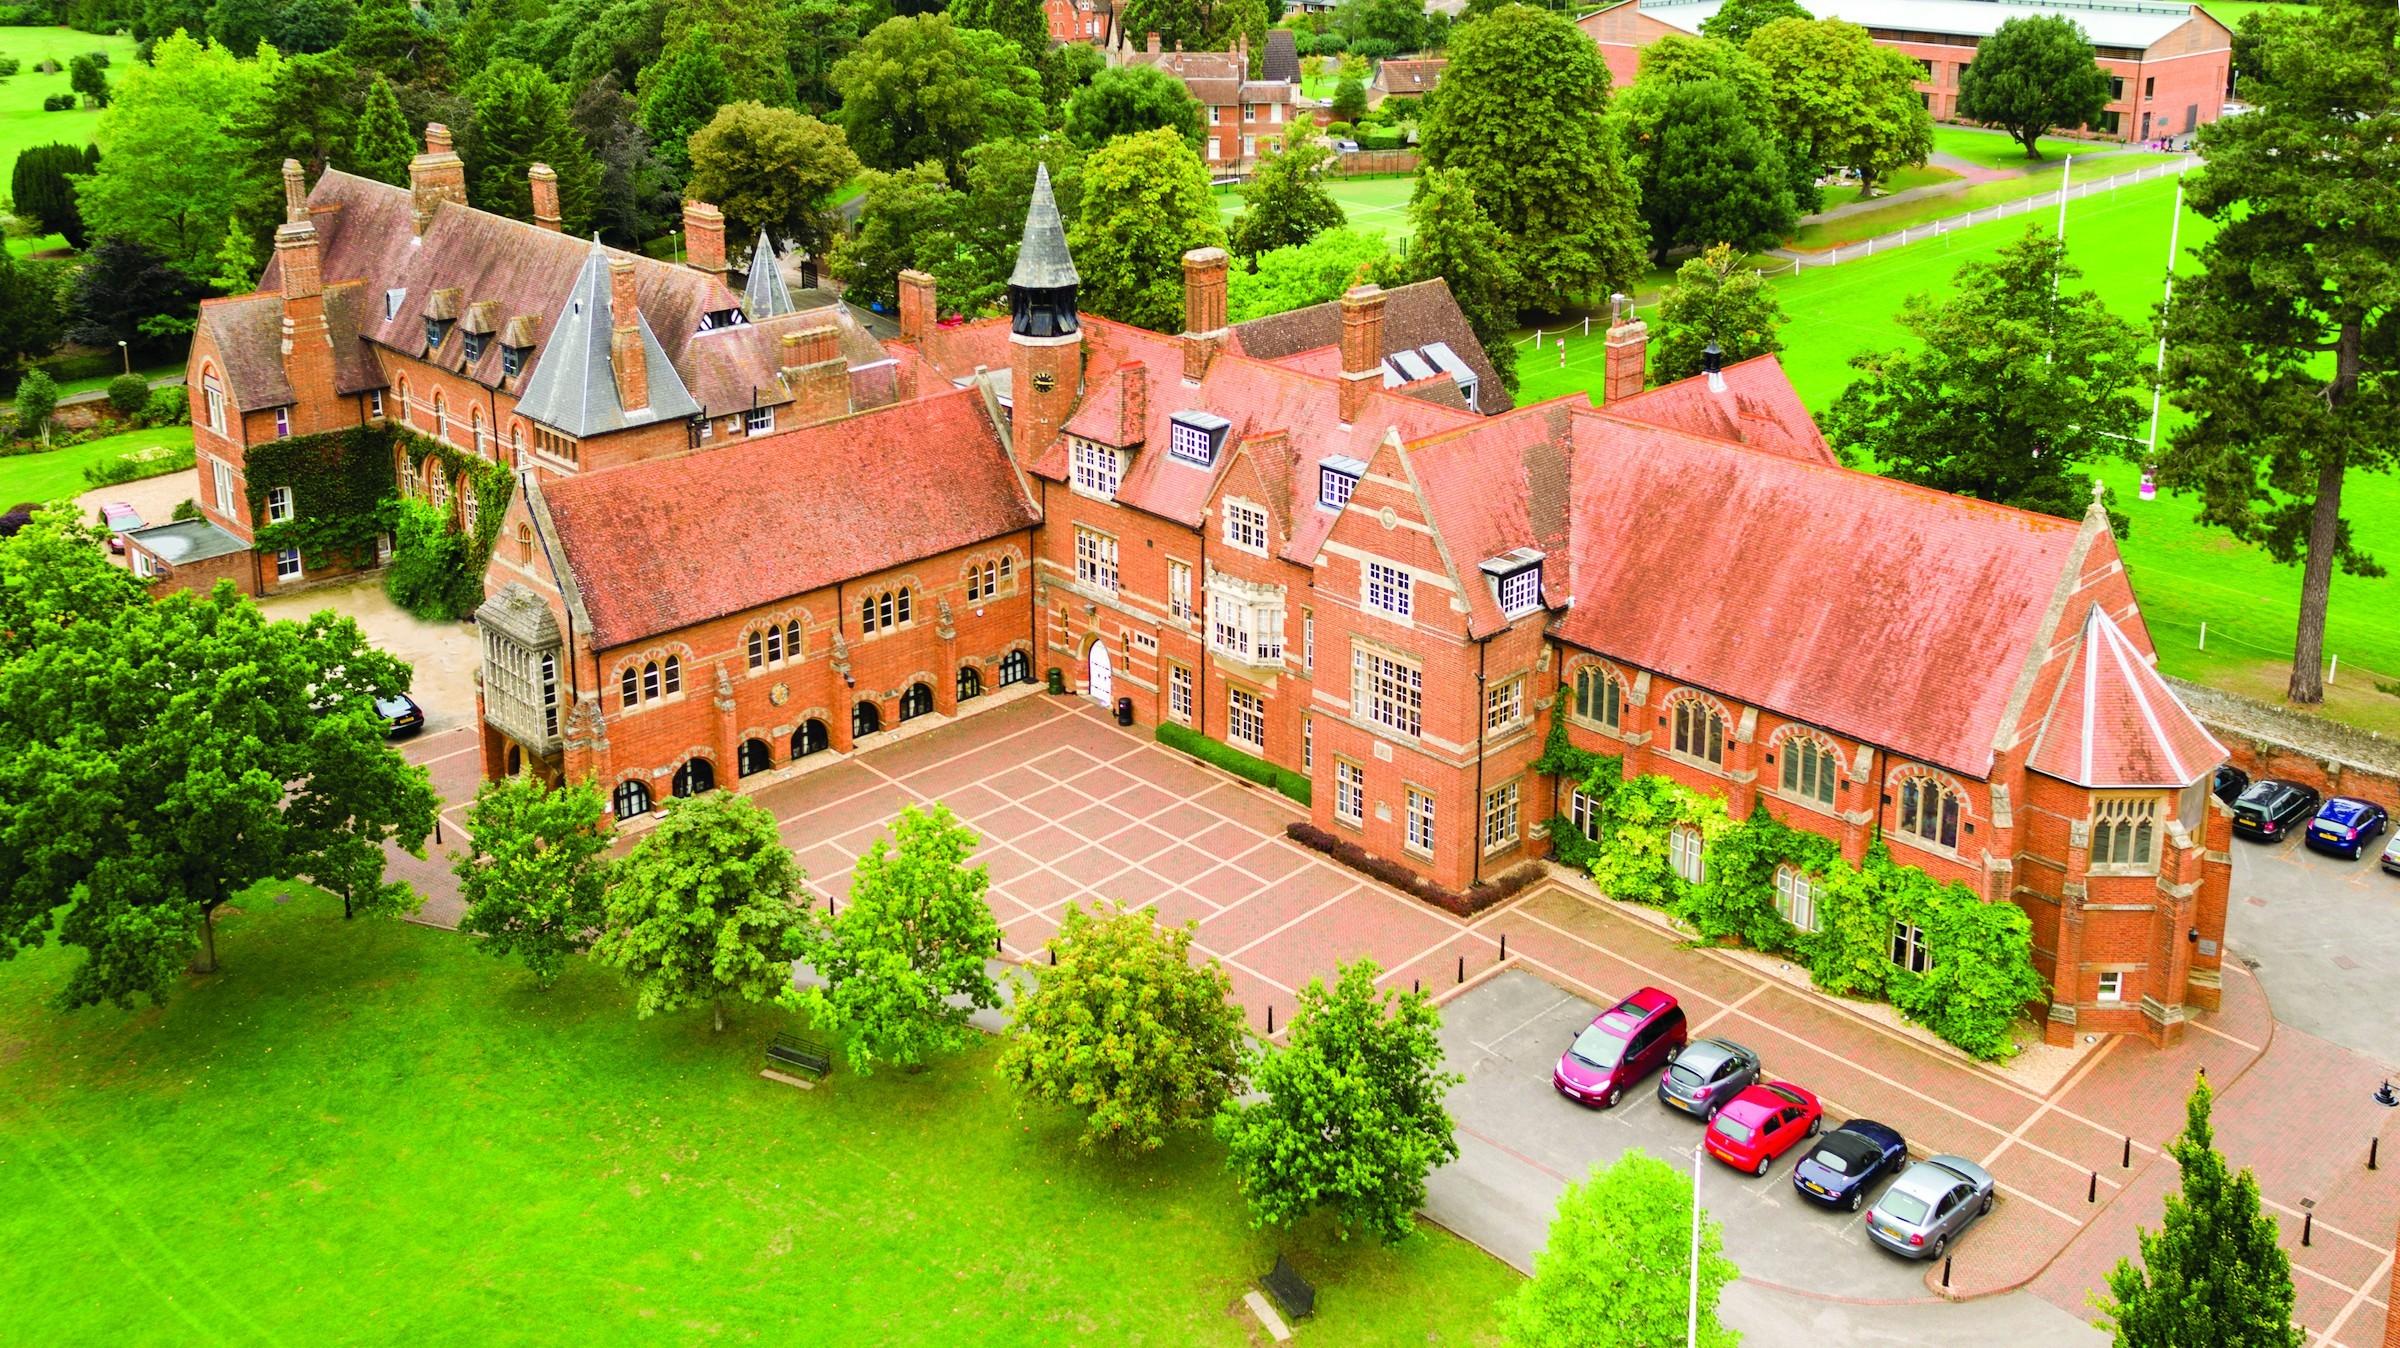 Abingdon College